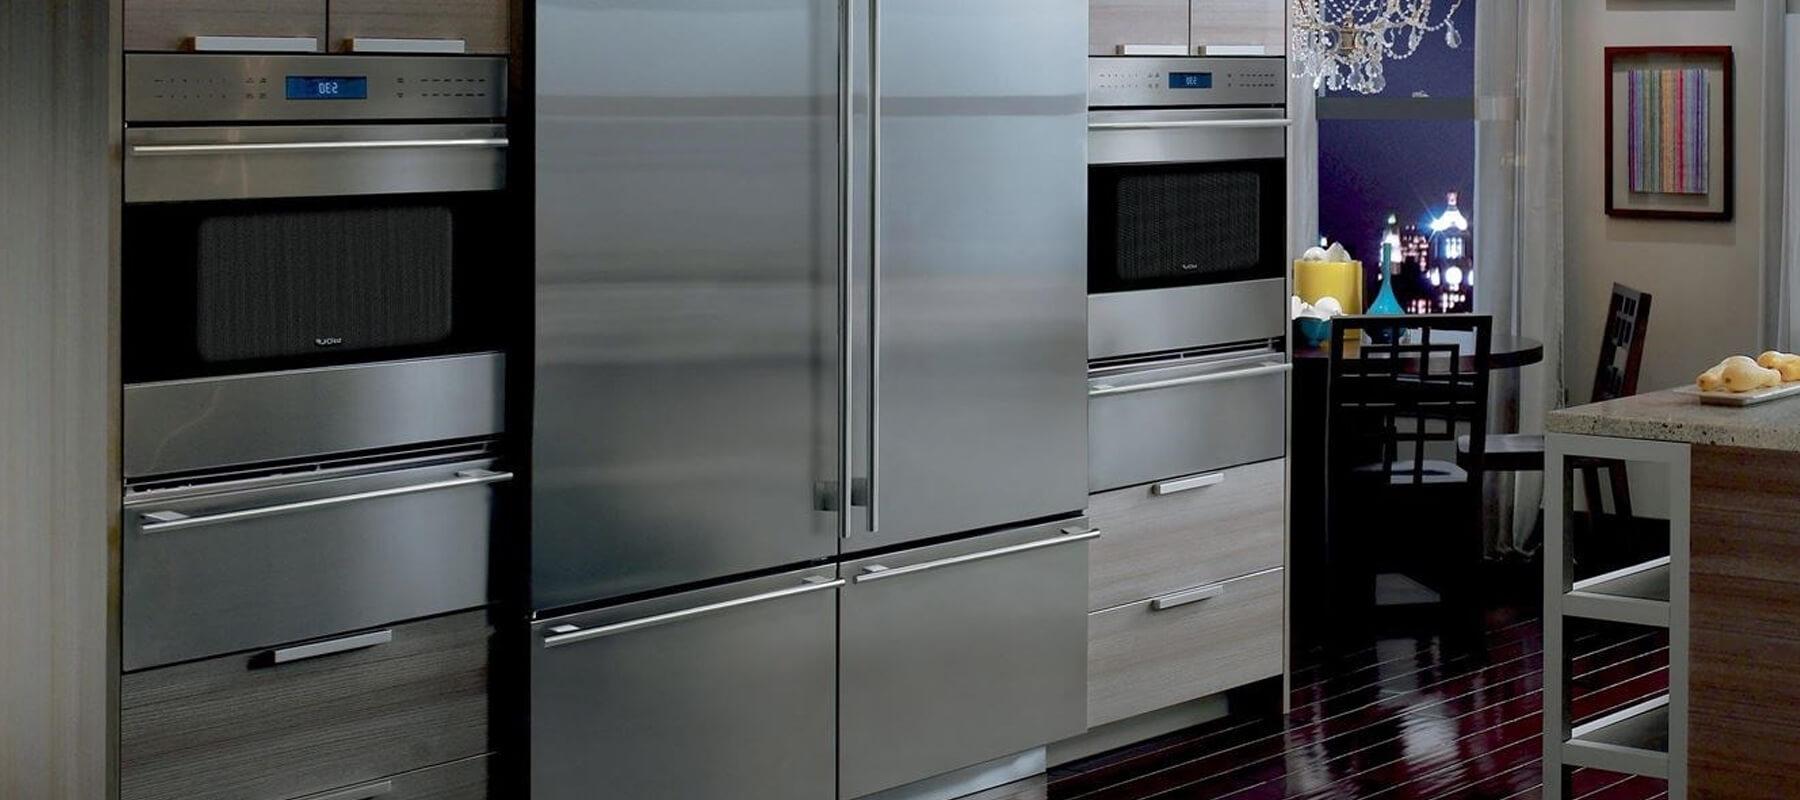 Built in Counter Depth Refrigerator Los Angeles | Built-in Refrigerator Repair